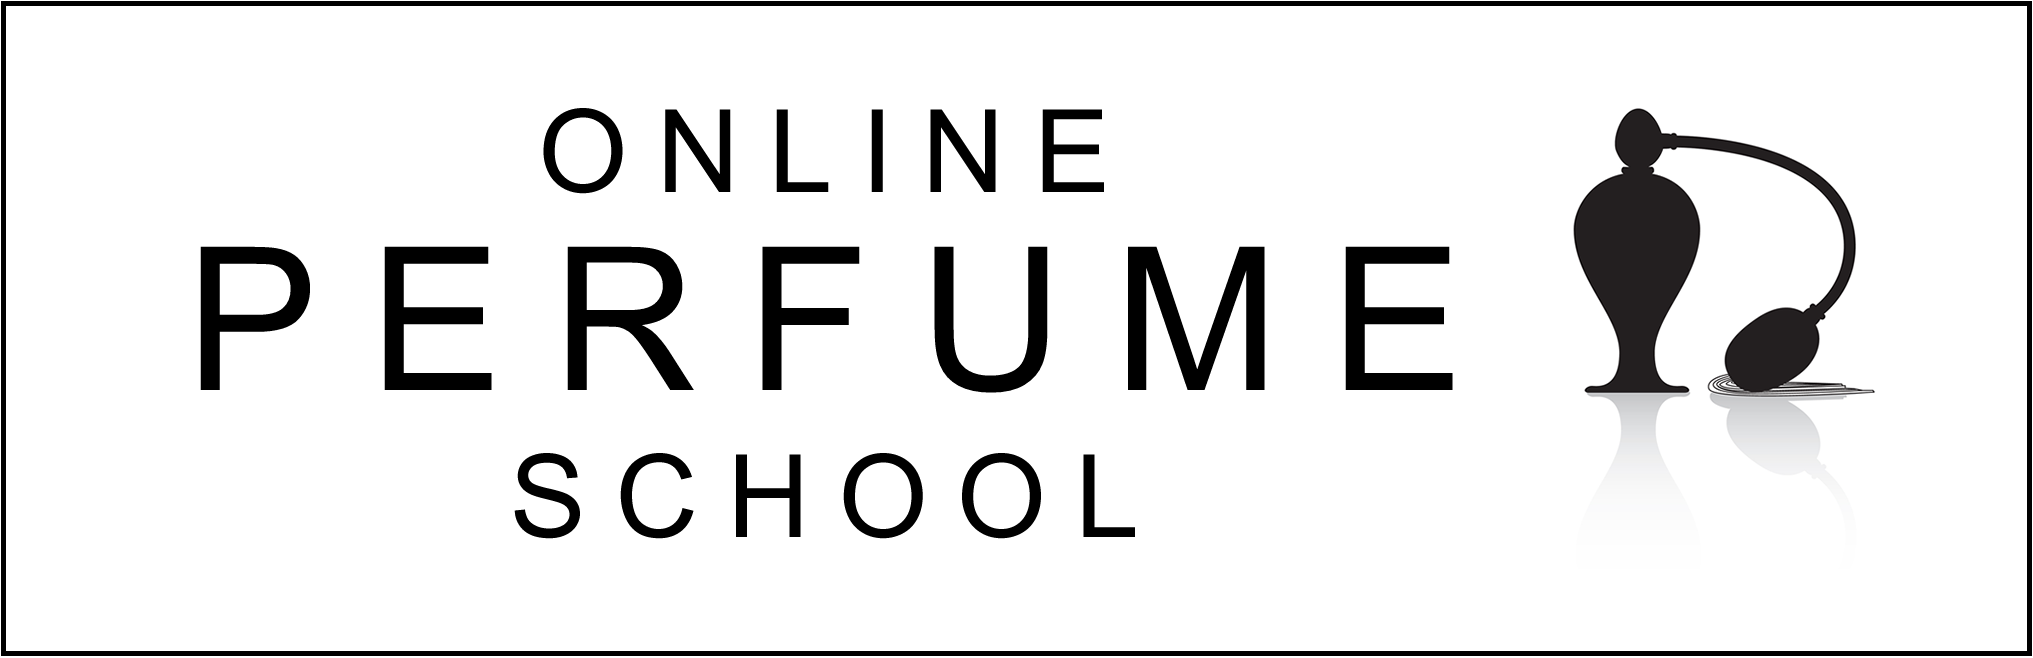 www.OnlinePerfumeSchool.com